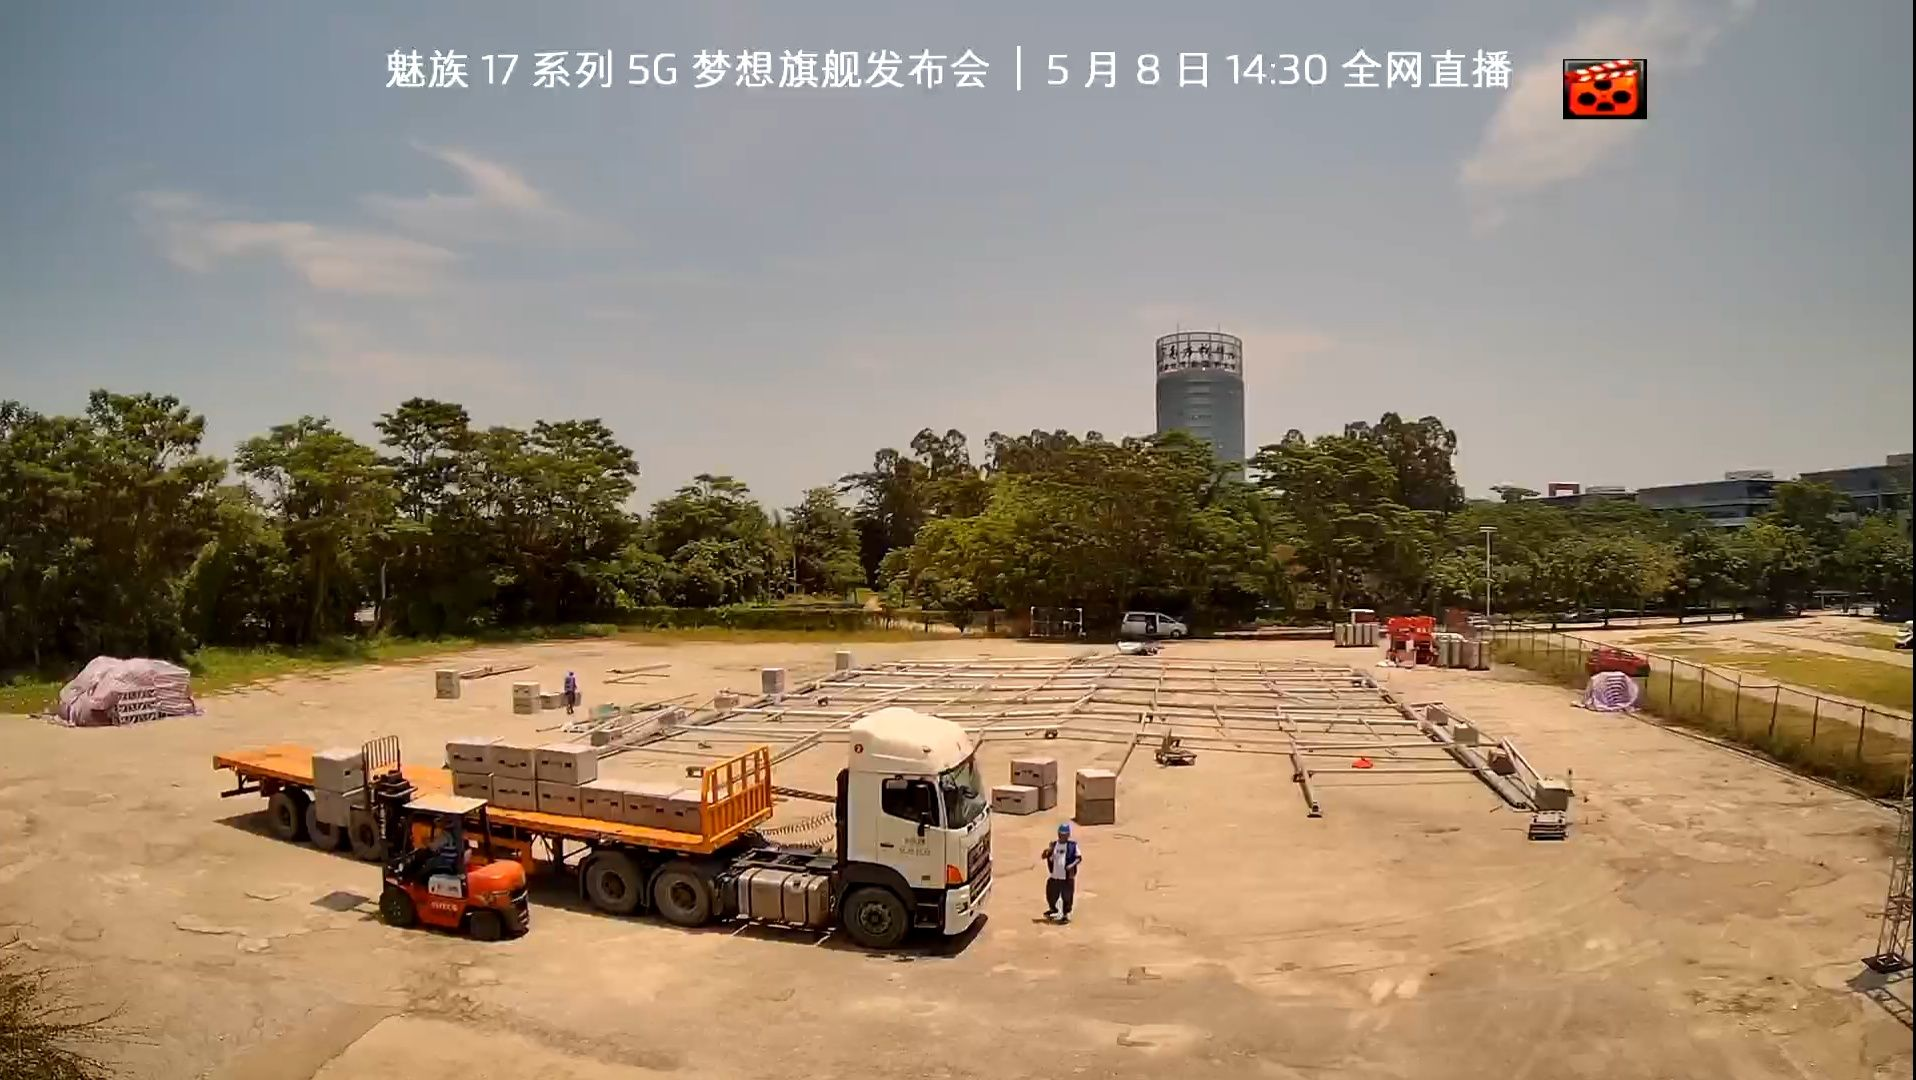 Meizuが発表会会場の建設の様子を公開、Meizu公式サイトとbilibiliで閲覧可能